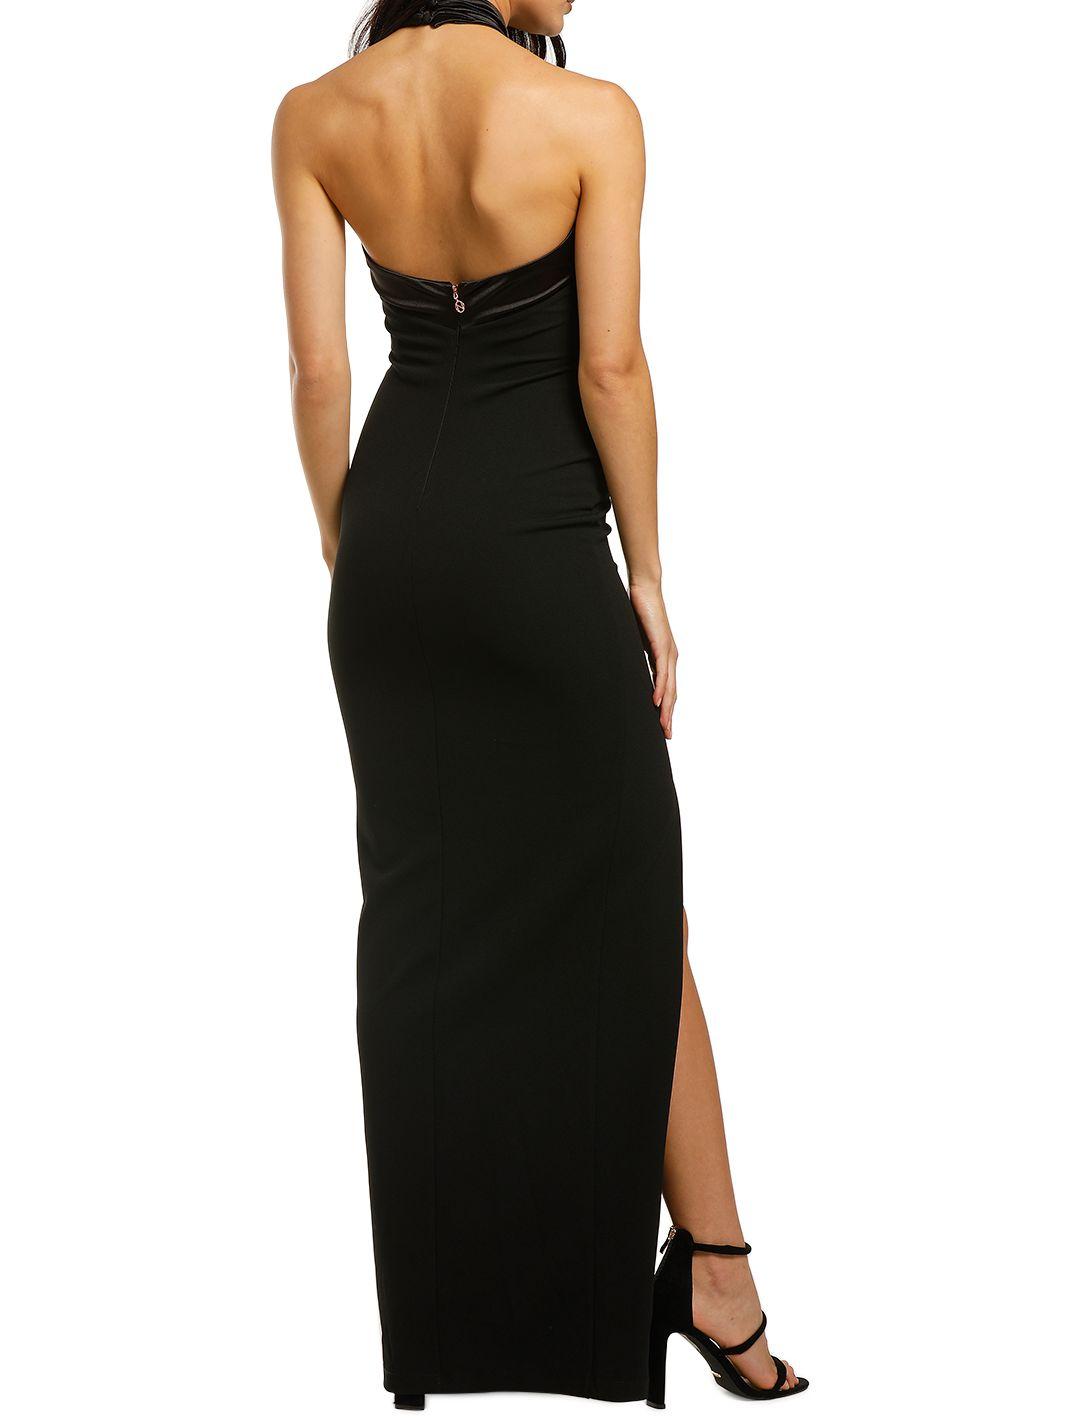 Nookie-Alias-Halter-Gown-Black-Back